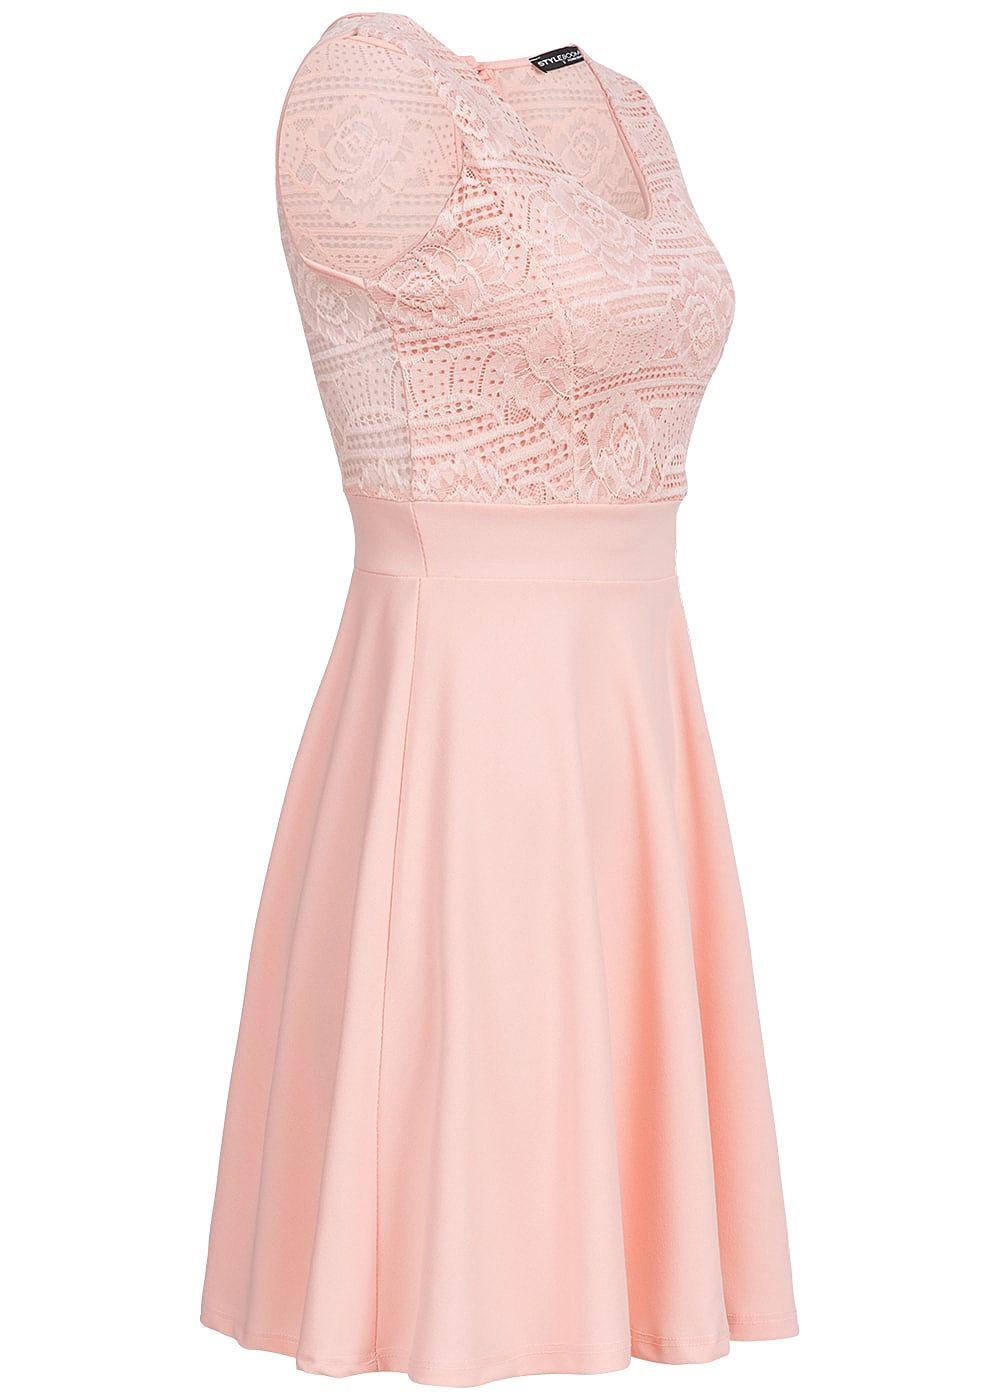 Styleboom Fashion Damen Mini Kleid Spitze oben Brustpads rosa ...